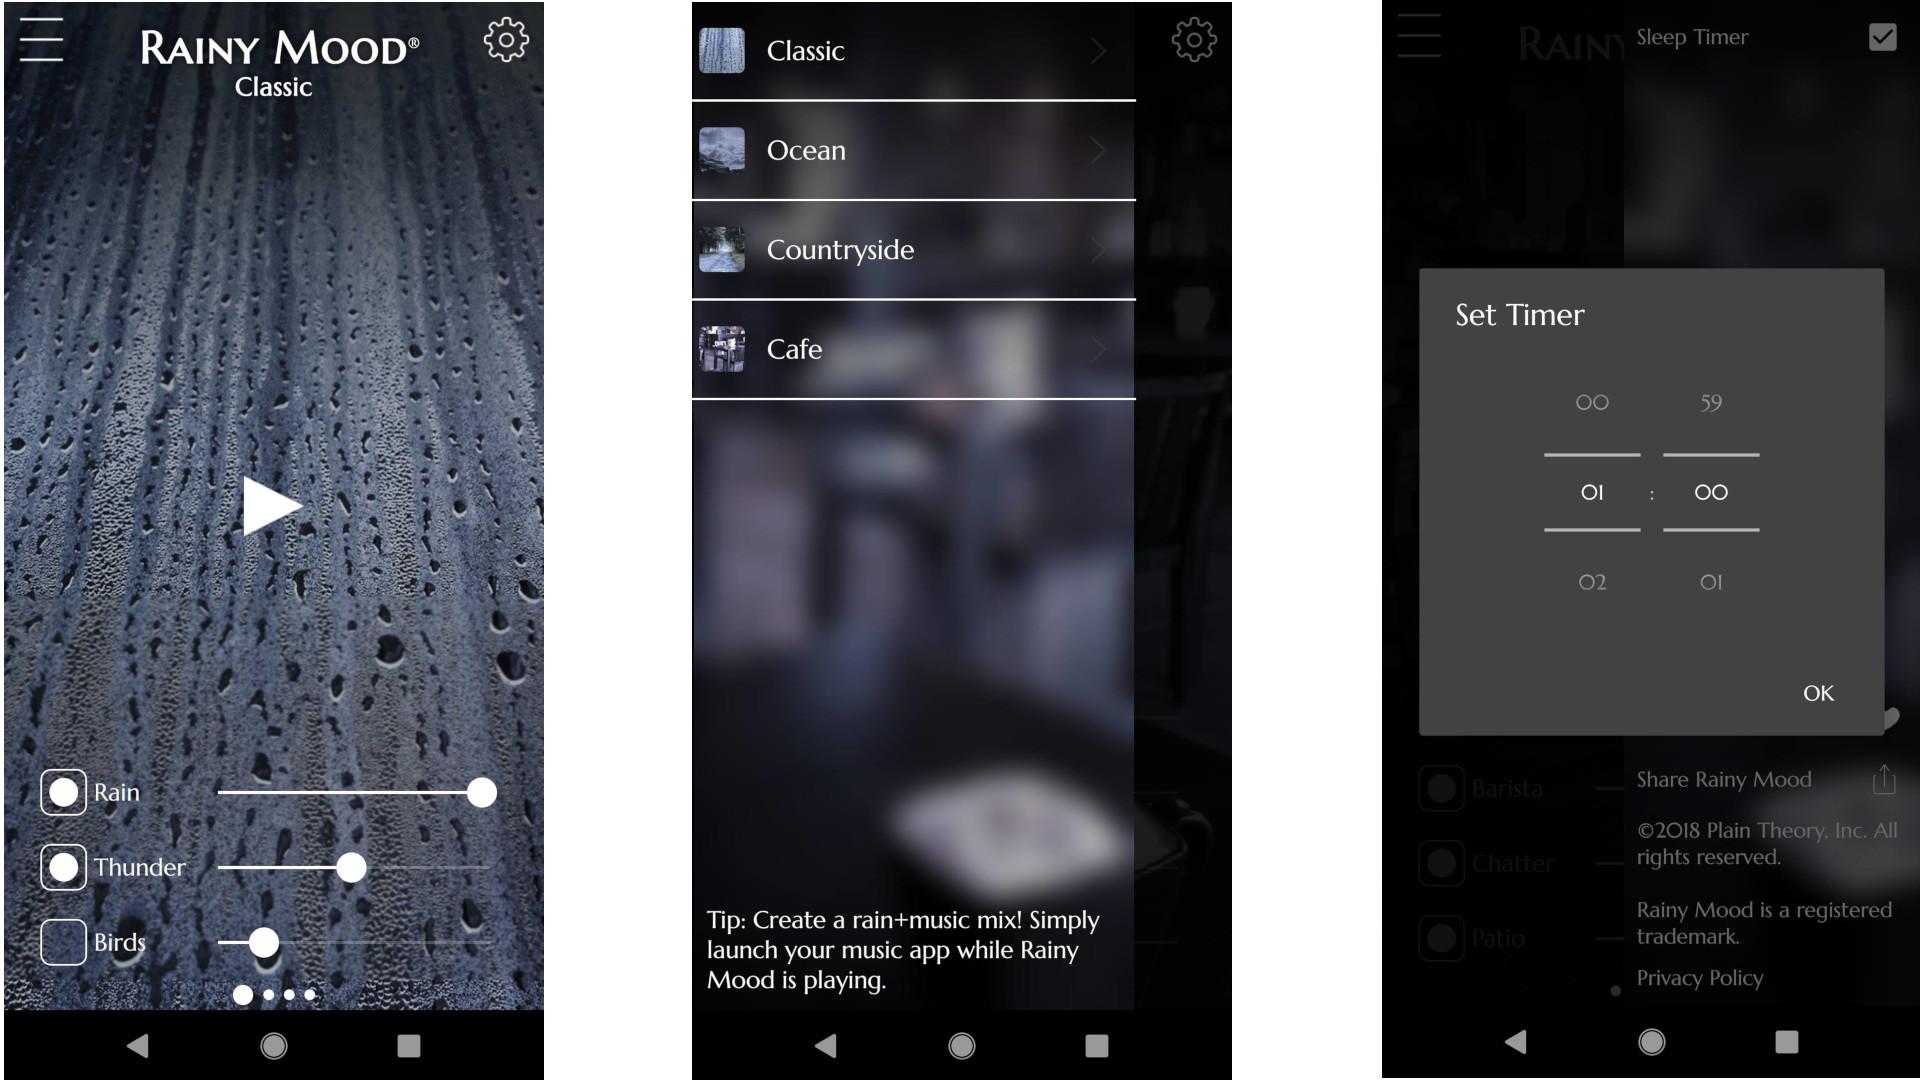 Screengrabs from Rainy Mood app